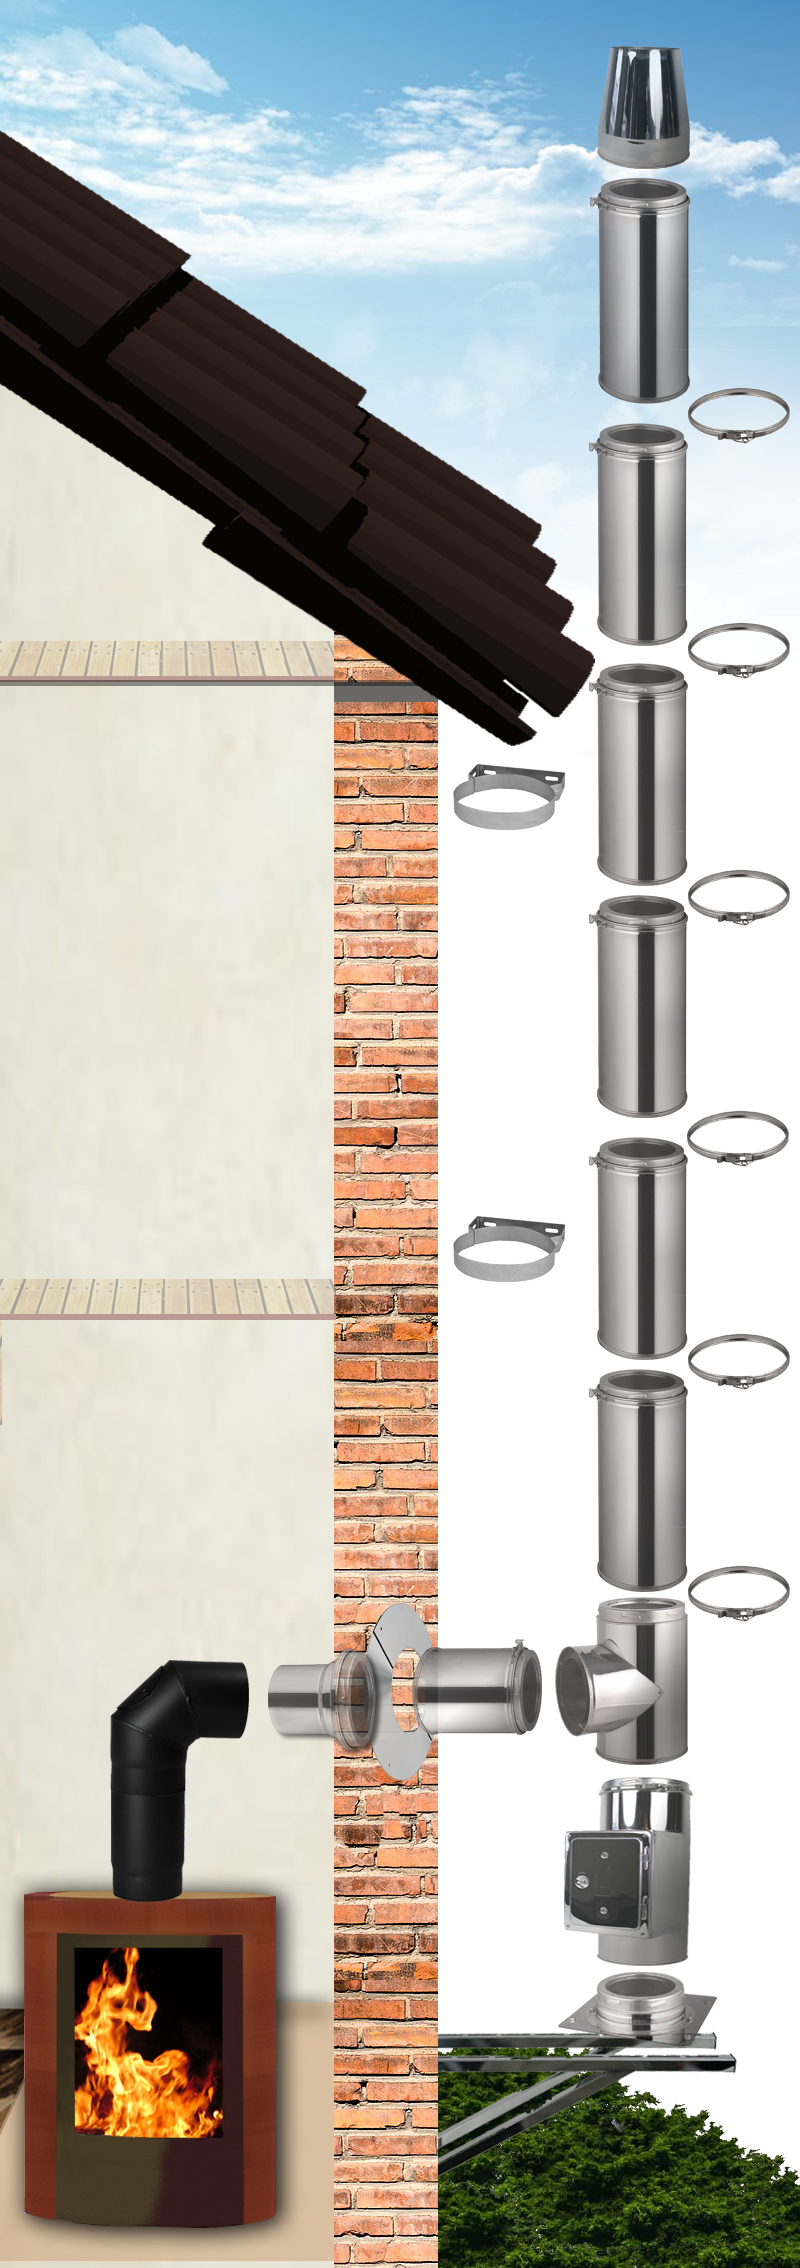 edelstahlschornstein bausatz 4 2m doppelwandig 130 200mm. Black Bedroom Furniture Sets. Home Design Ideas